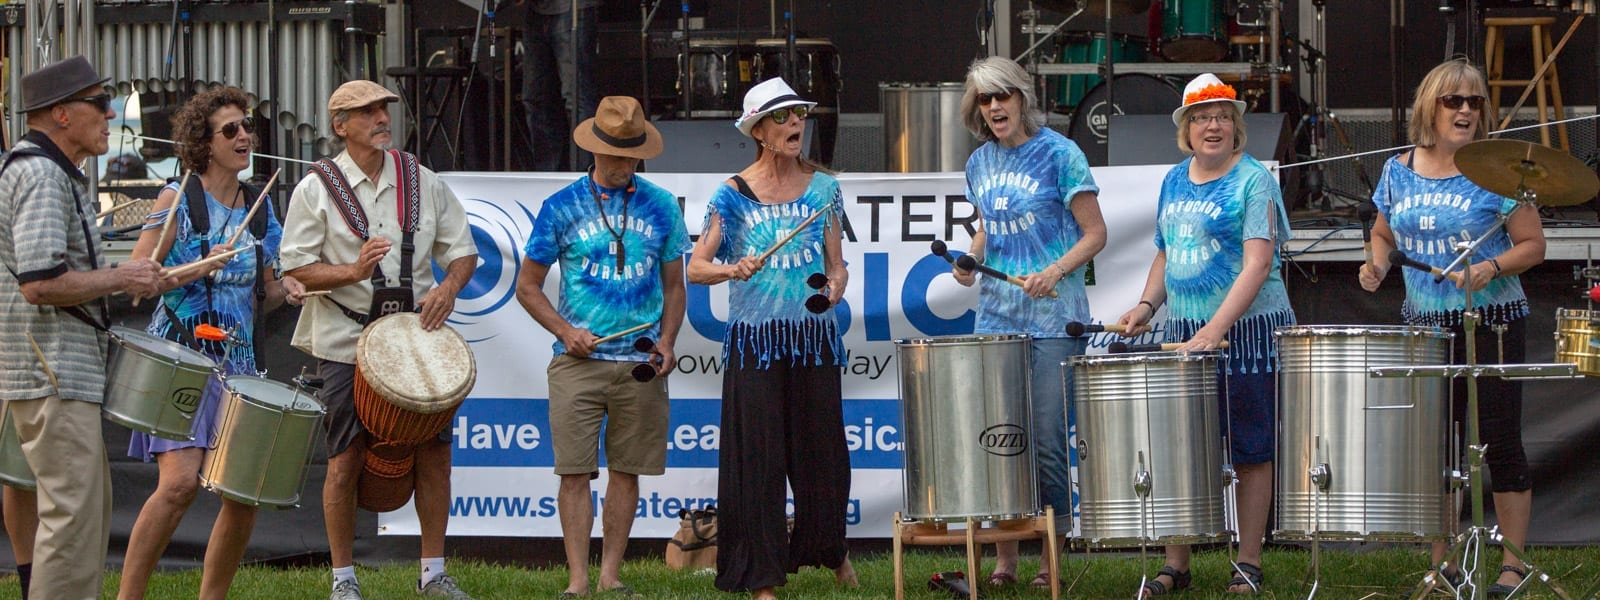 Batucada Community Band